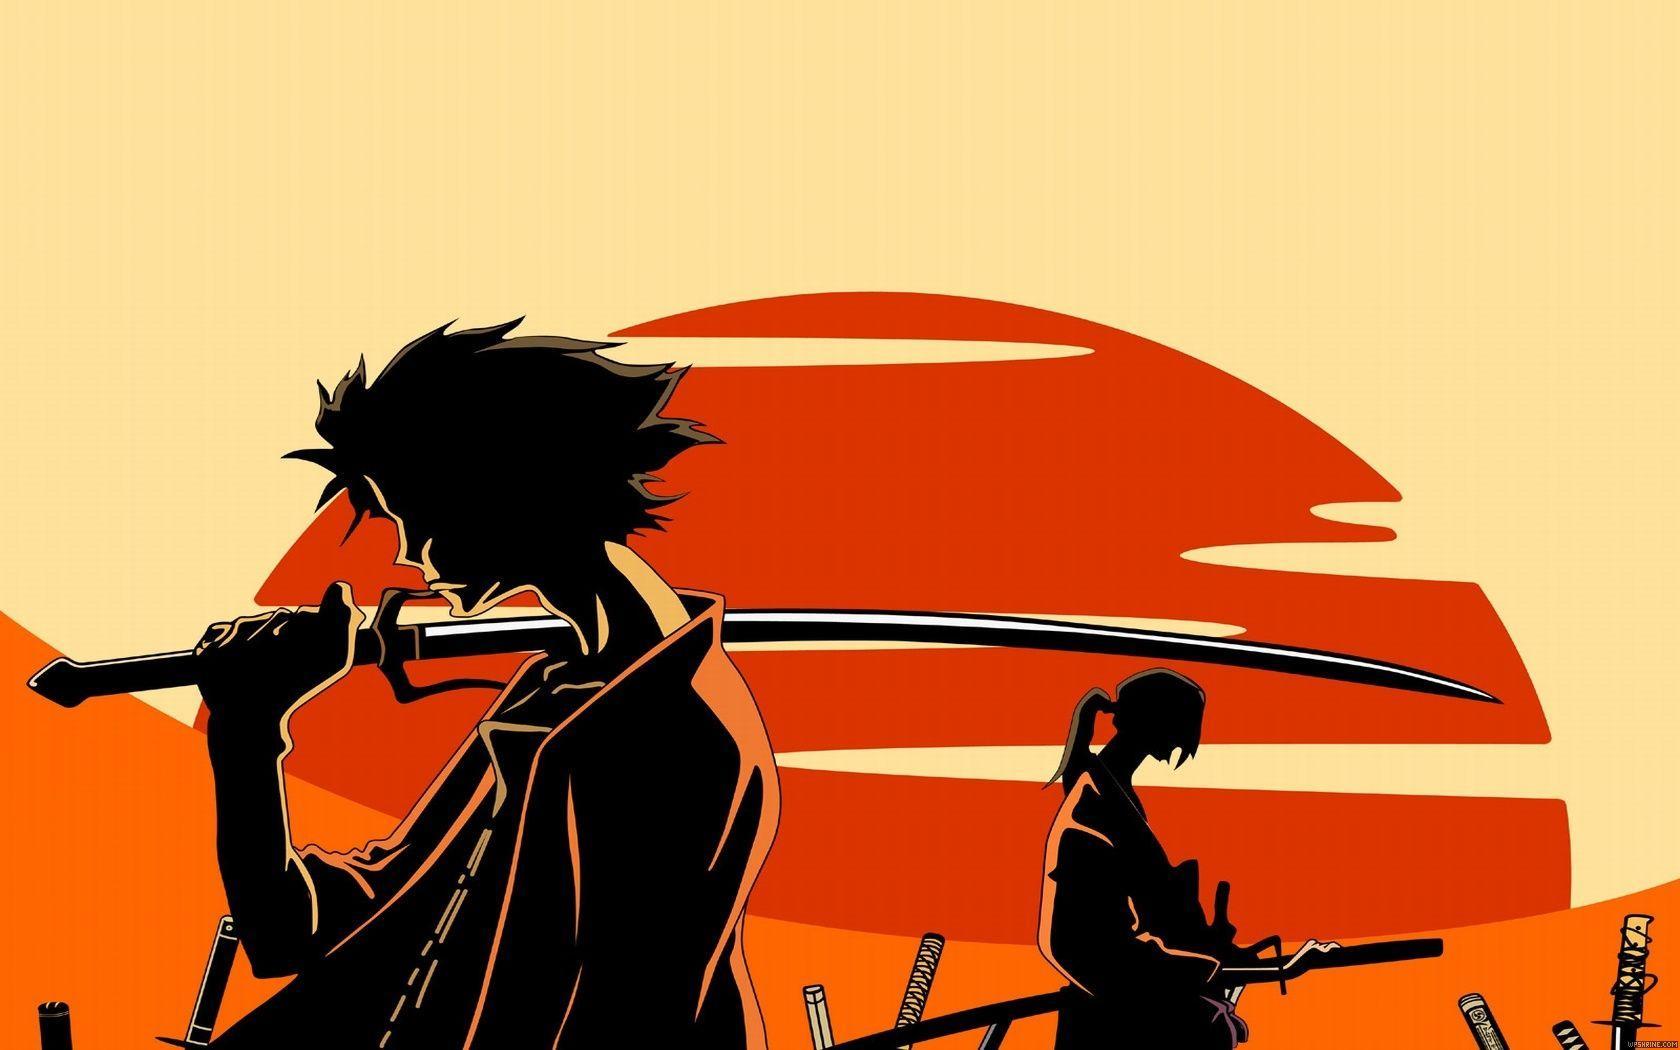 Samurai Swordsman Wallpapers Top Free Samurai Swordsman